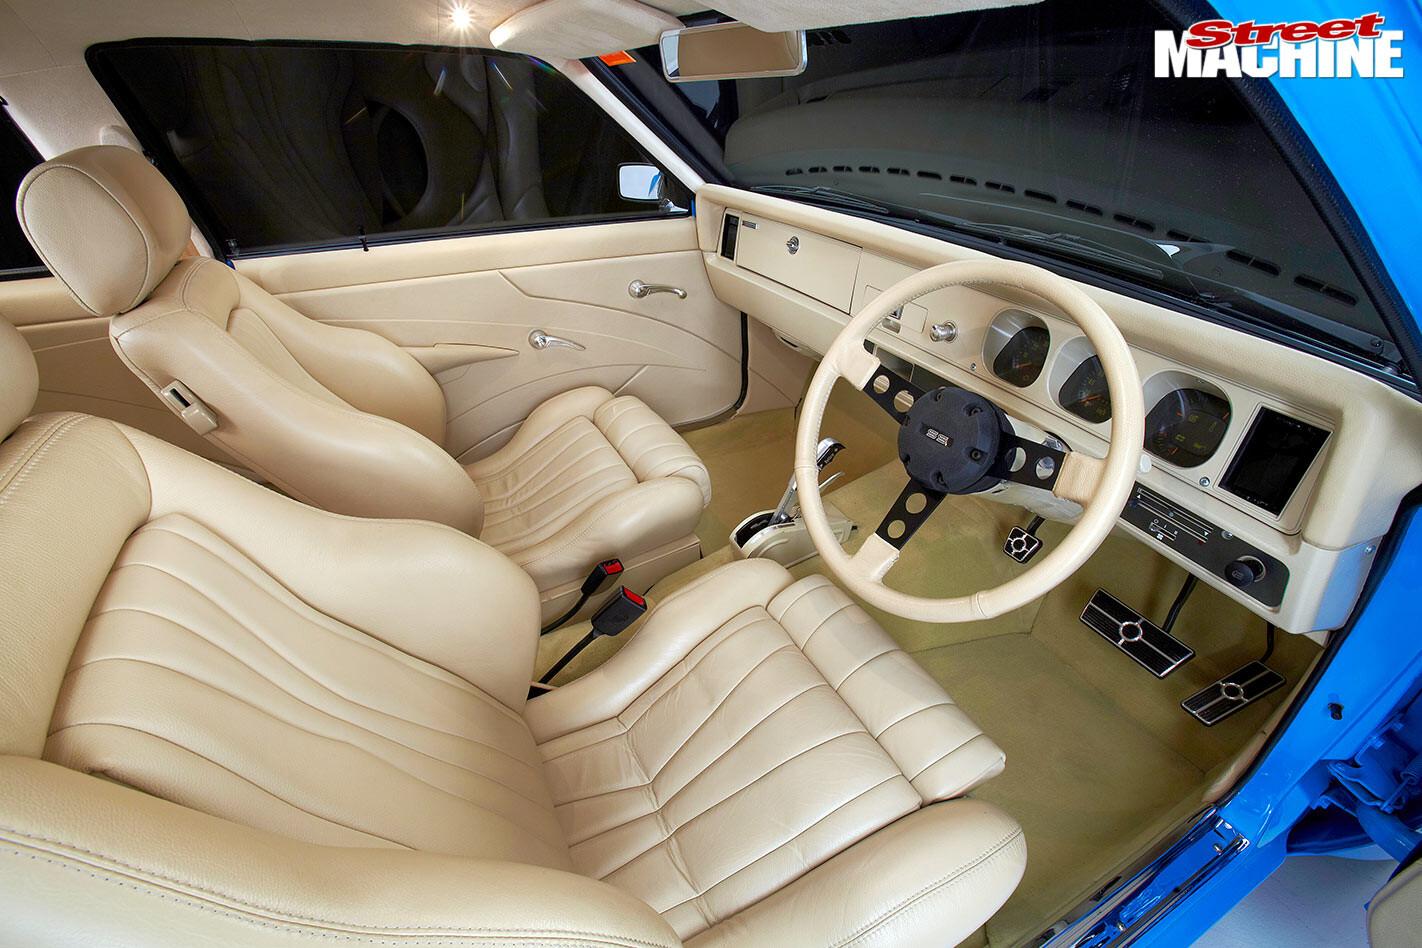 Holden Torana LX interior